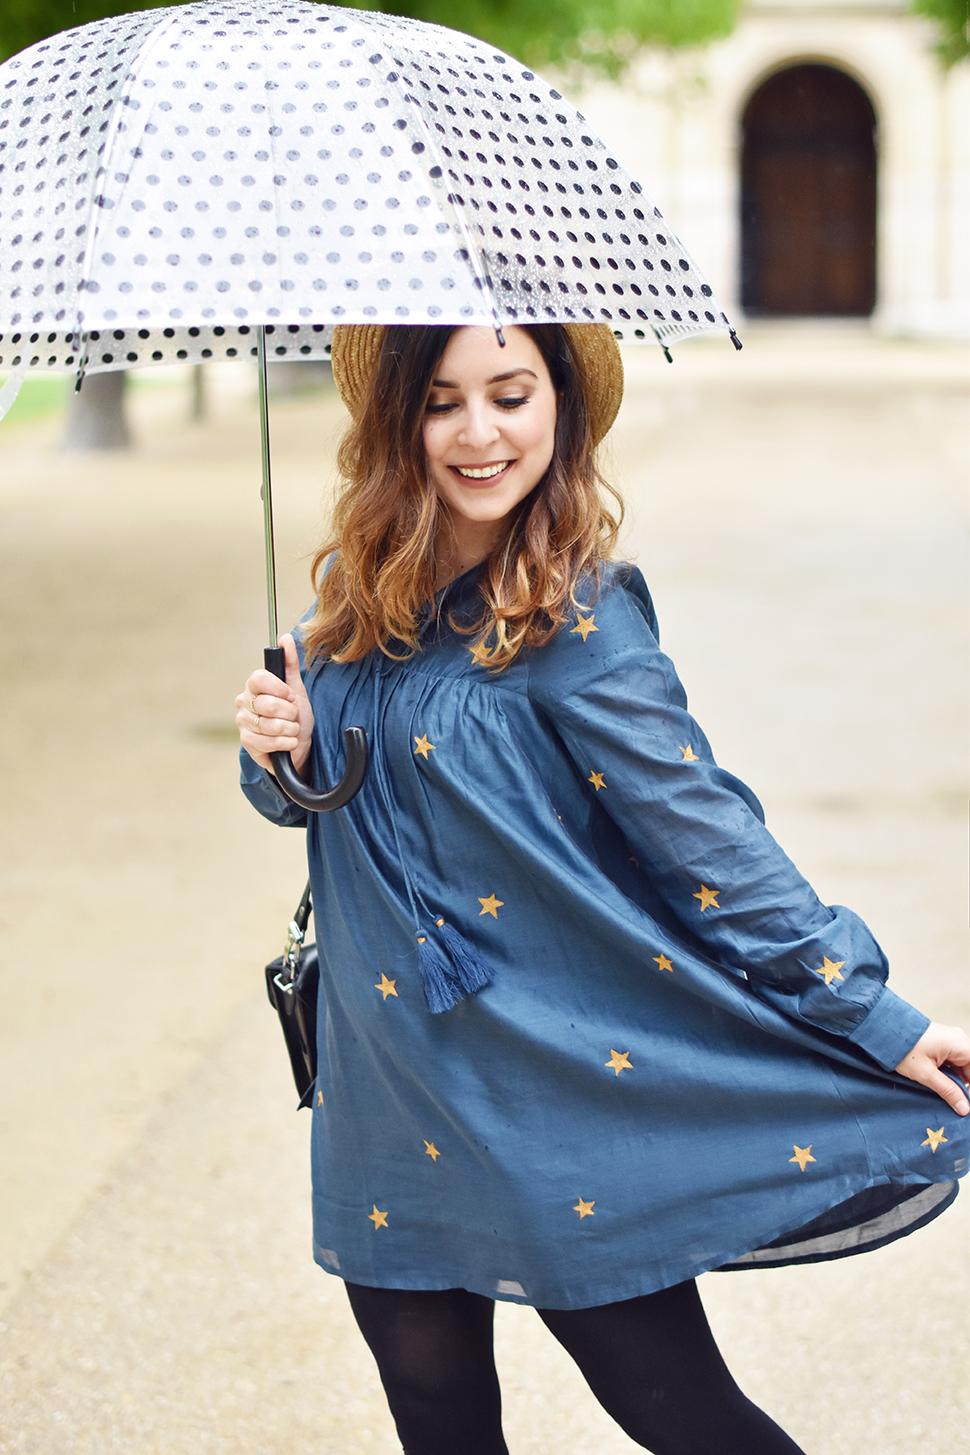 Helloitsvalentine_umbrella_7